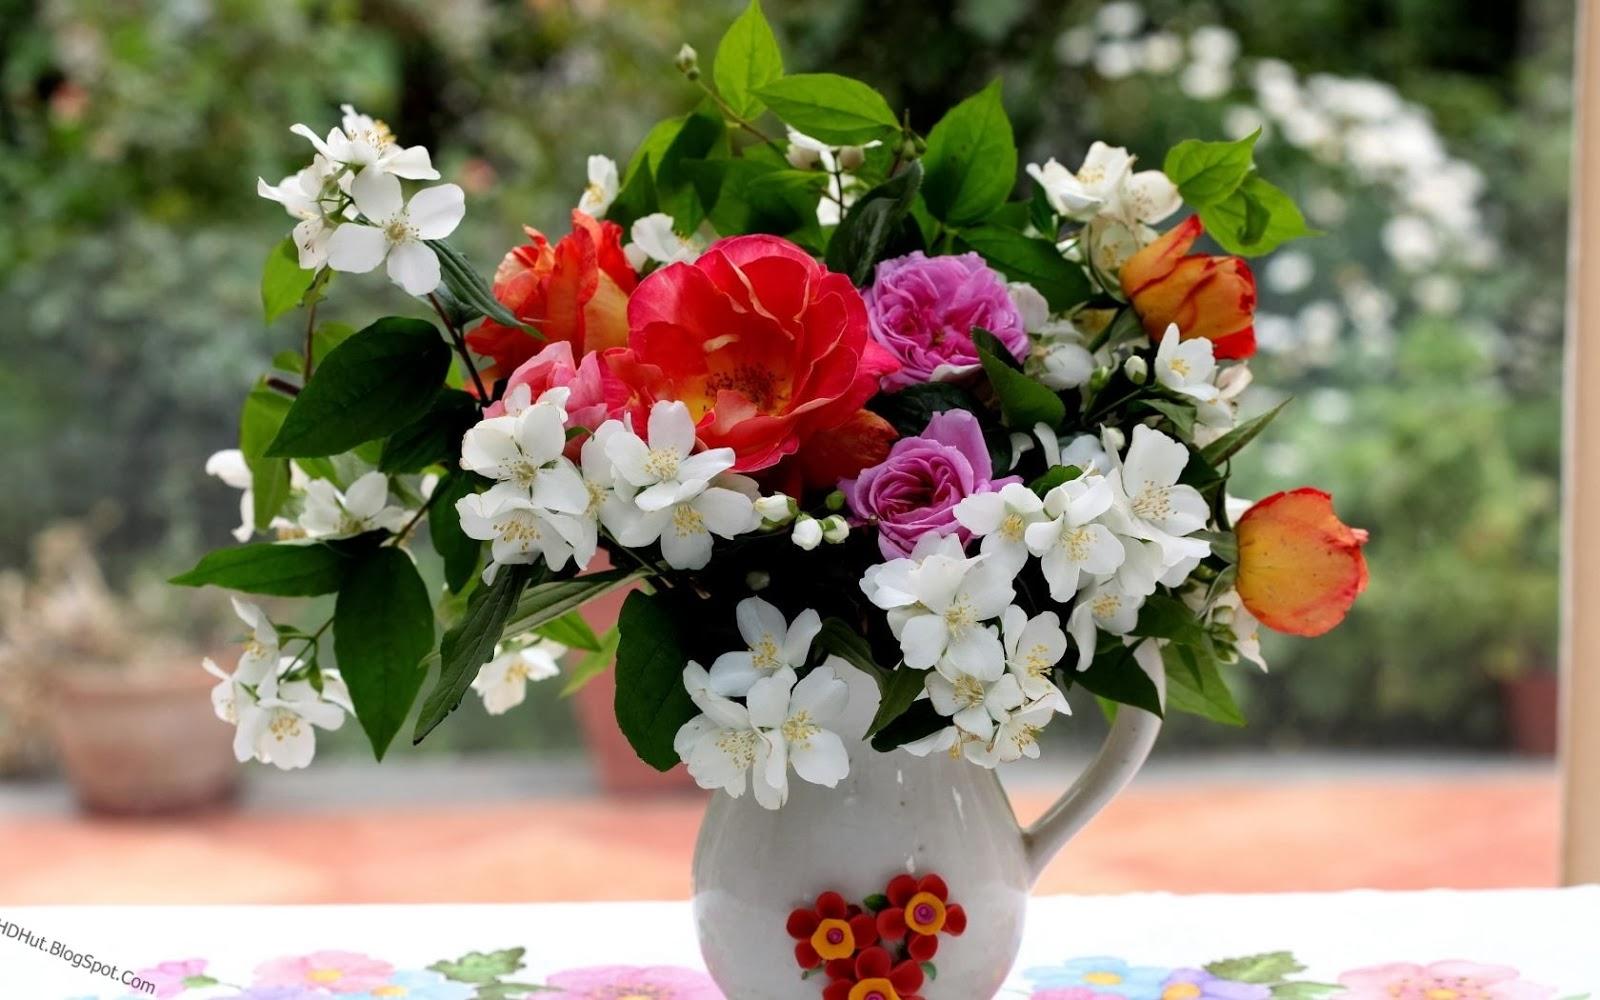 Year2008 Top 20 Jasmine Flower Wallpapers In Hd